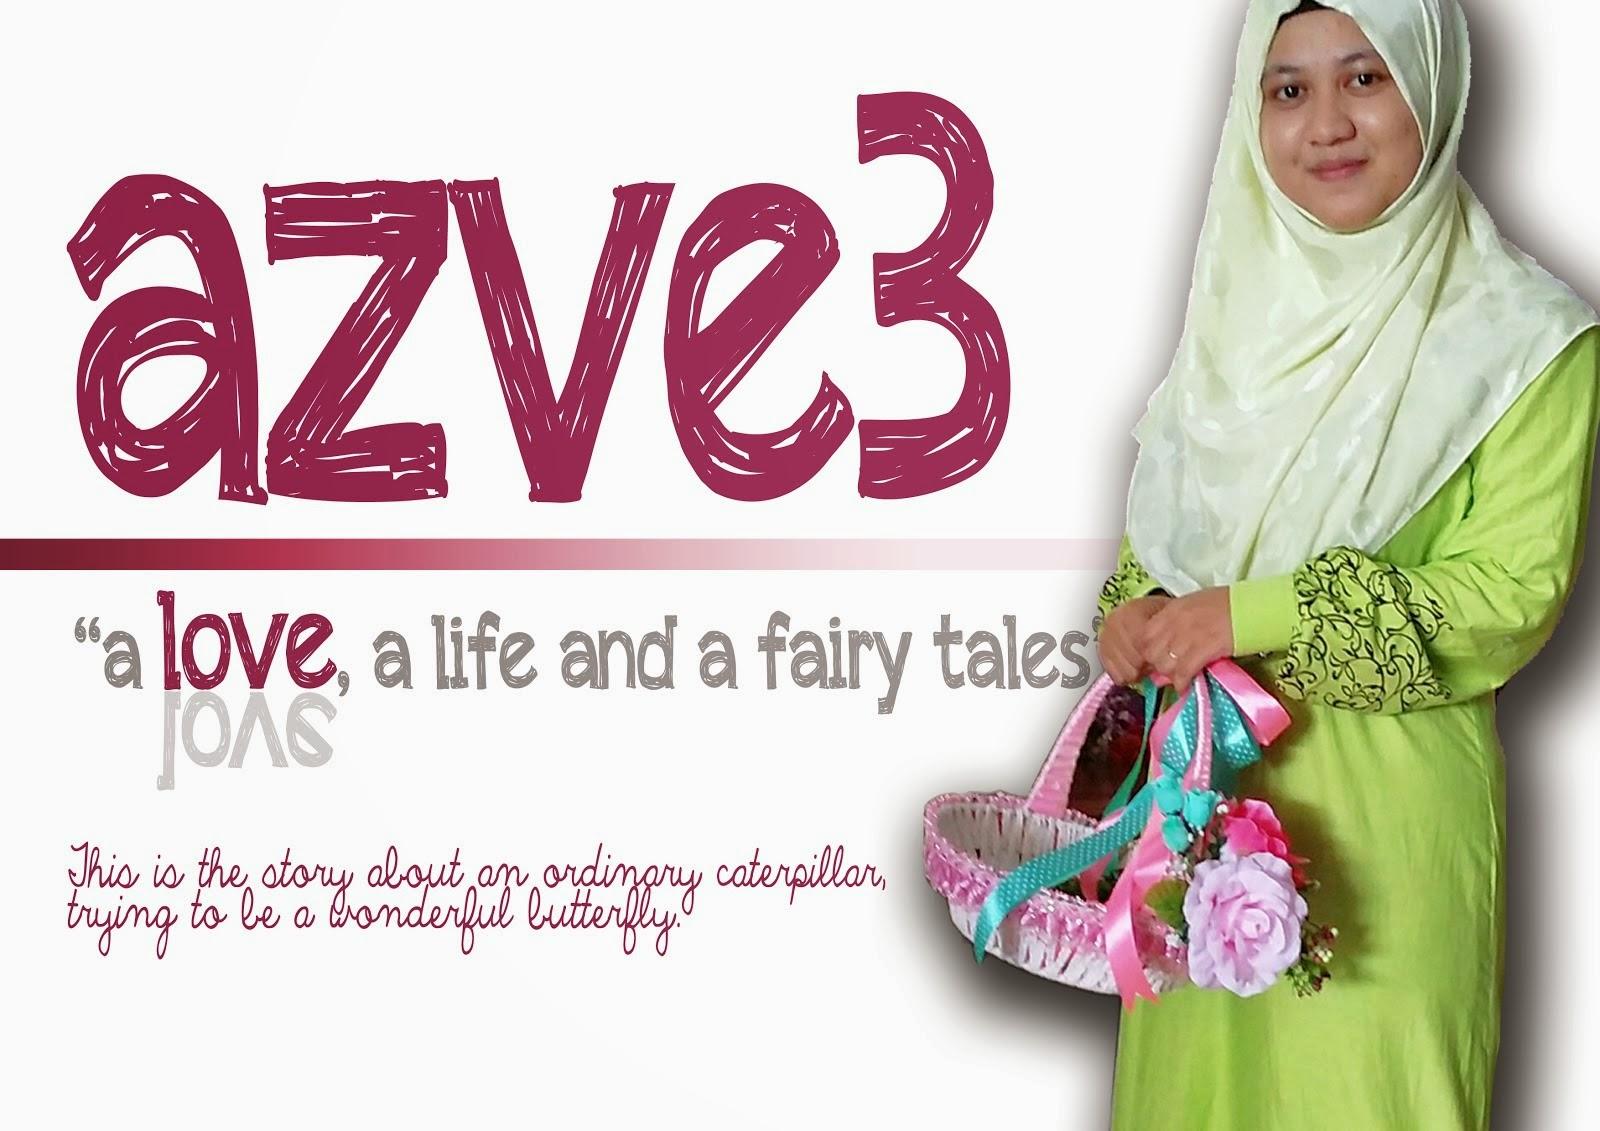 azve3